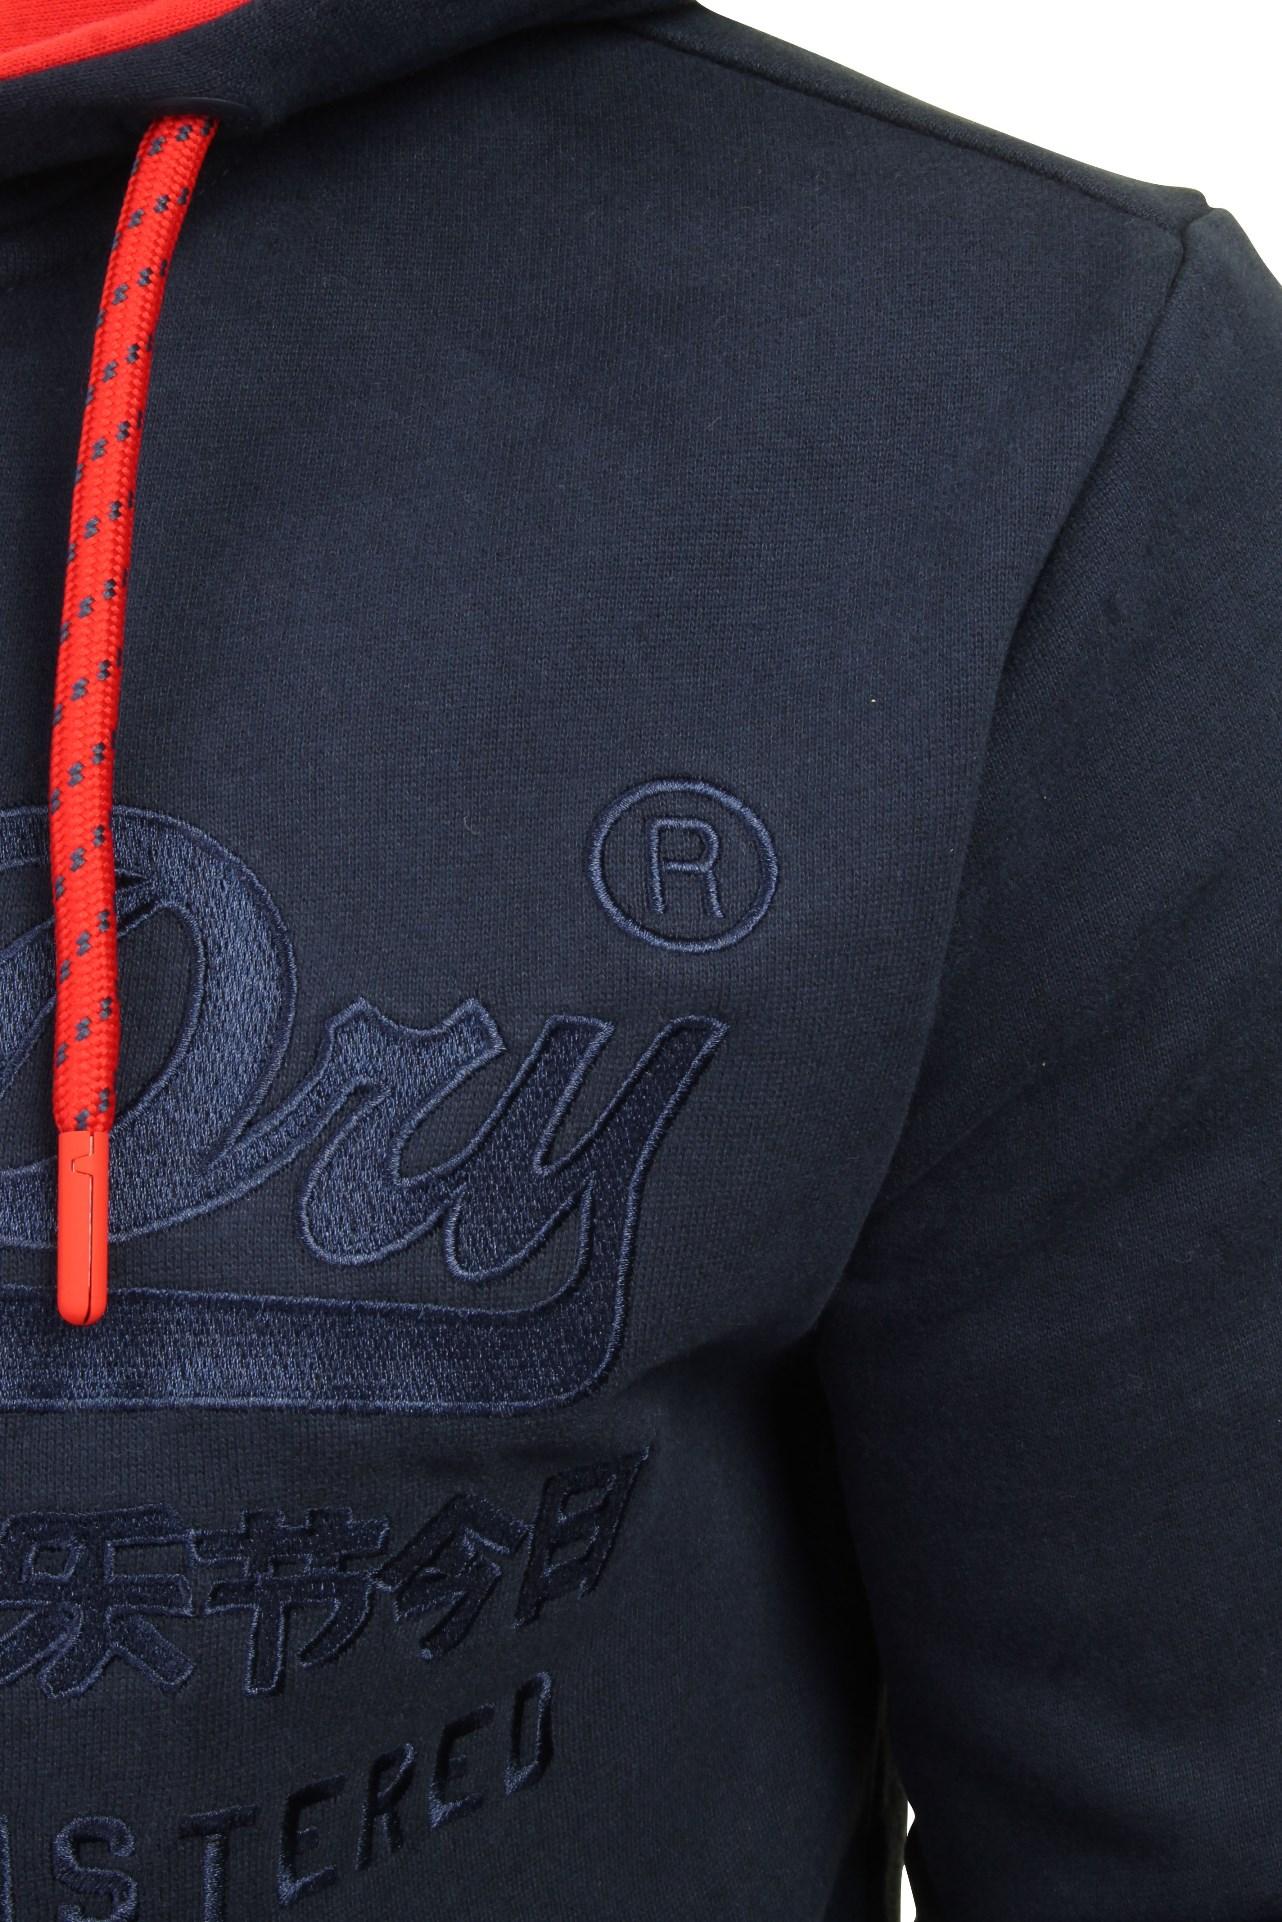 Superdry Downhill Racer App Ziphood Sweat-Shirt /À Capuche Homme